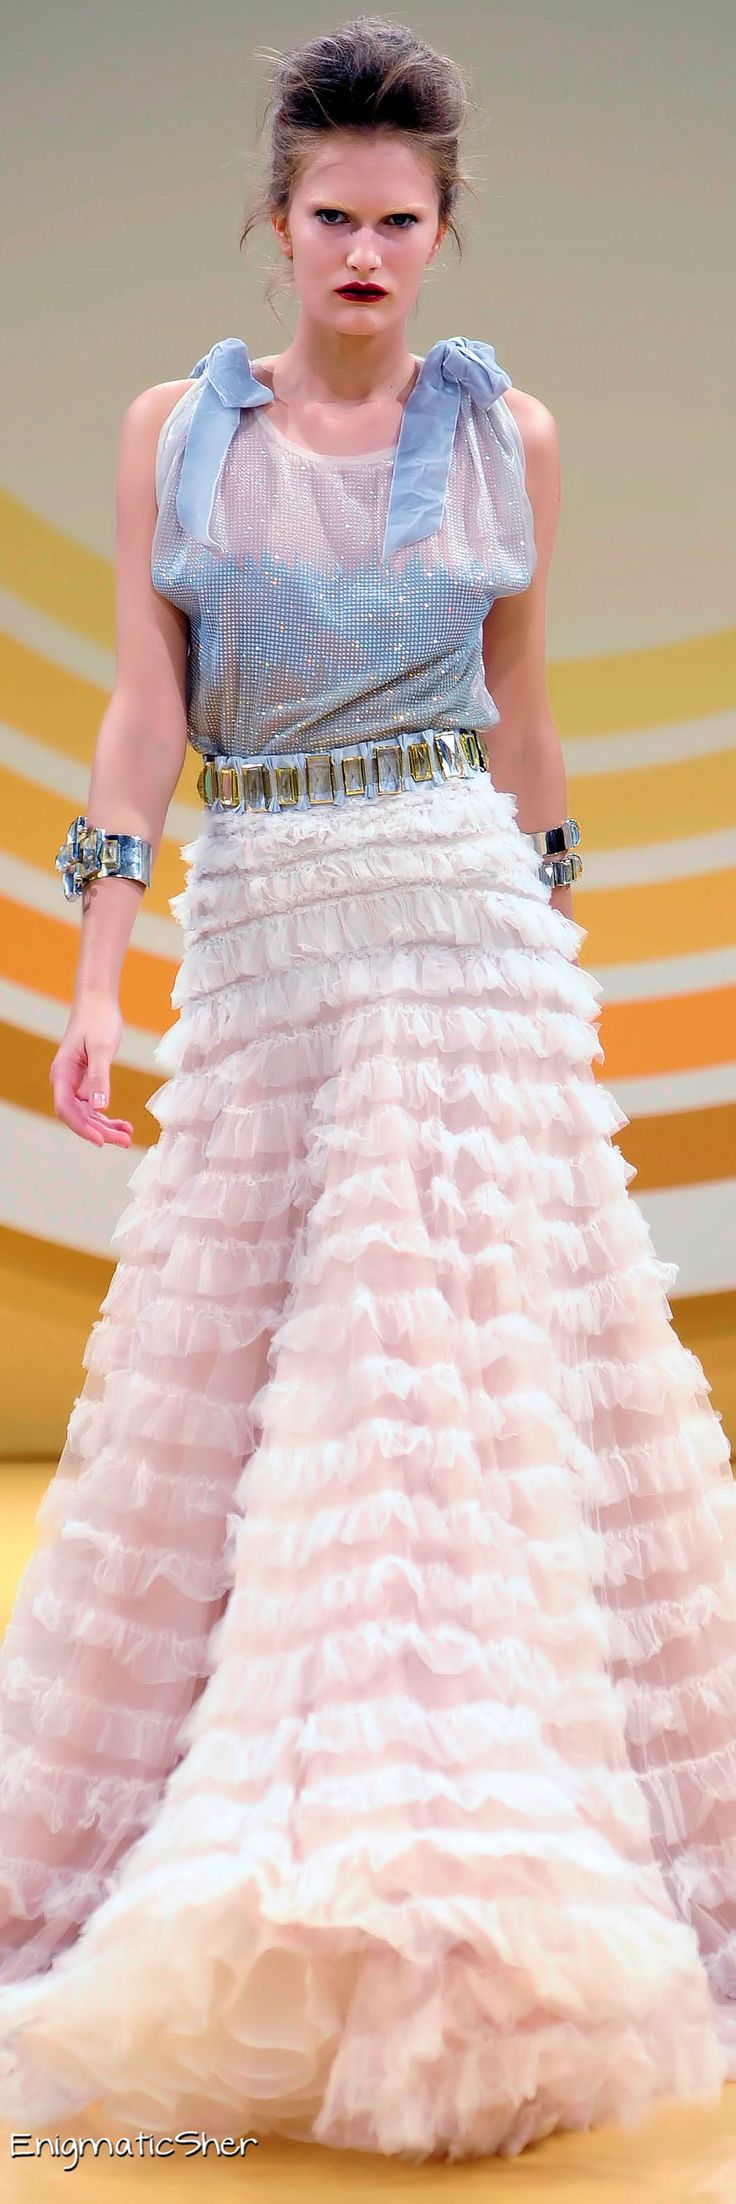 Jenny Packham Spring Summer 2010 Ready-To-Wear